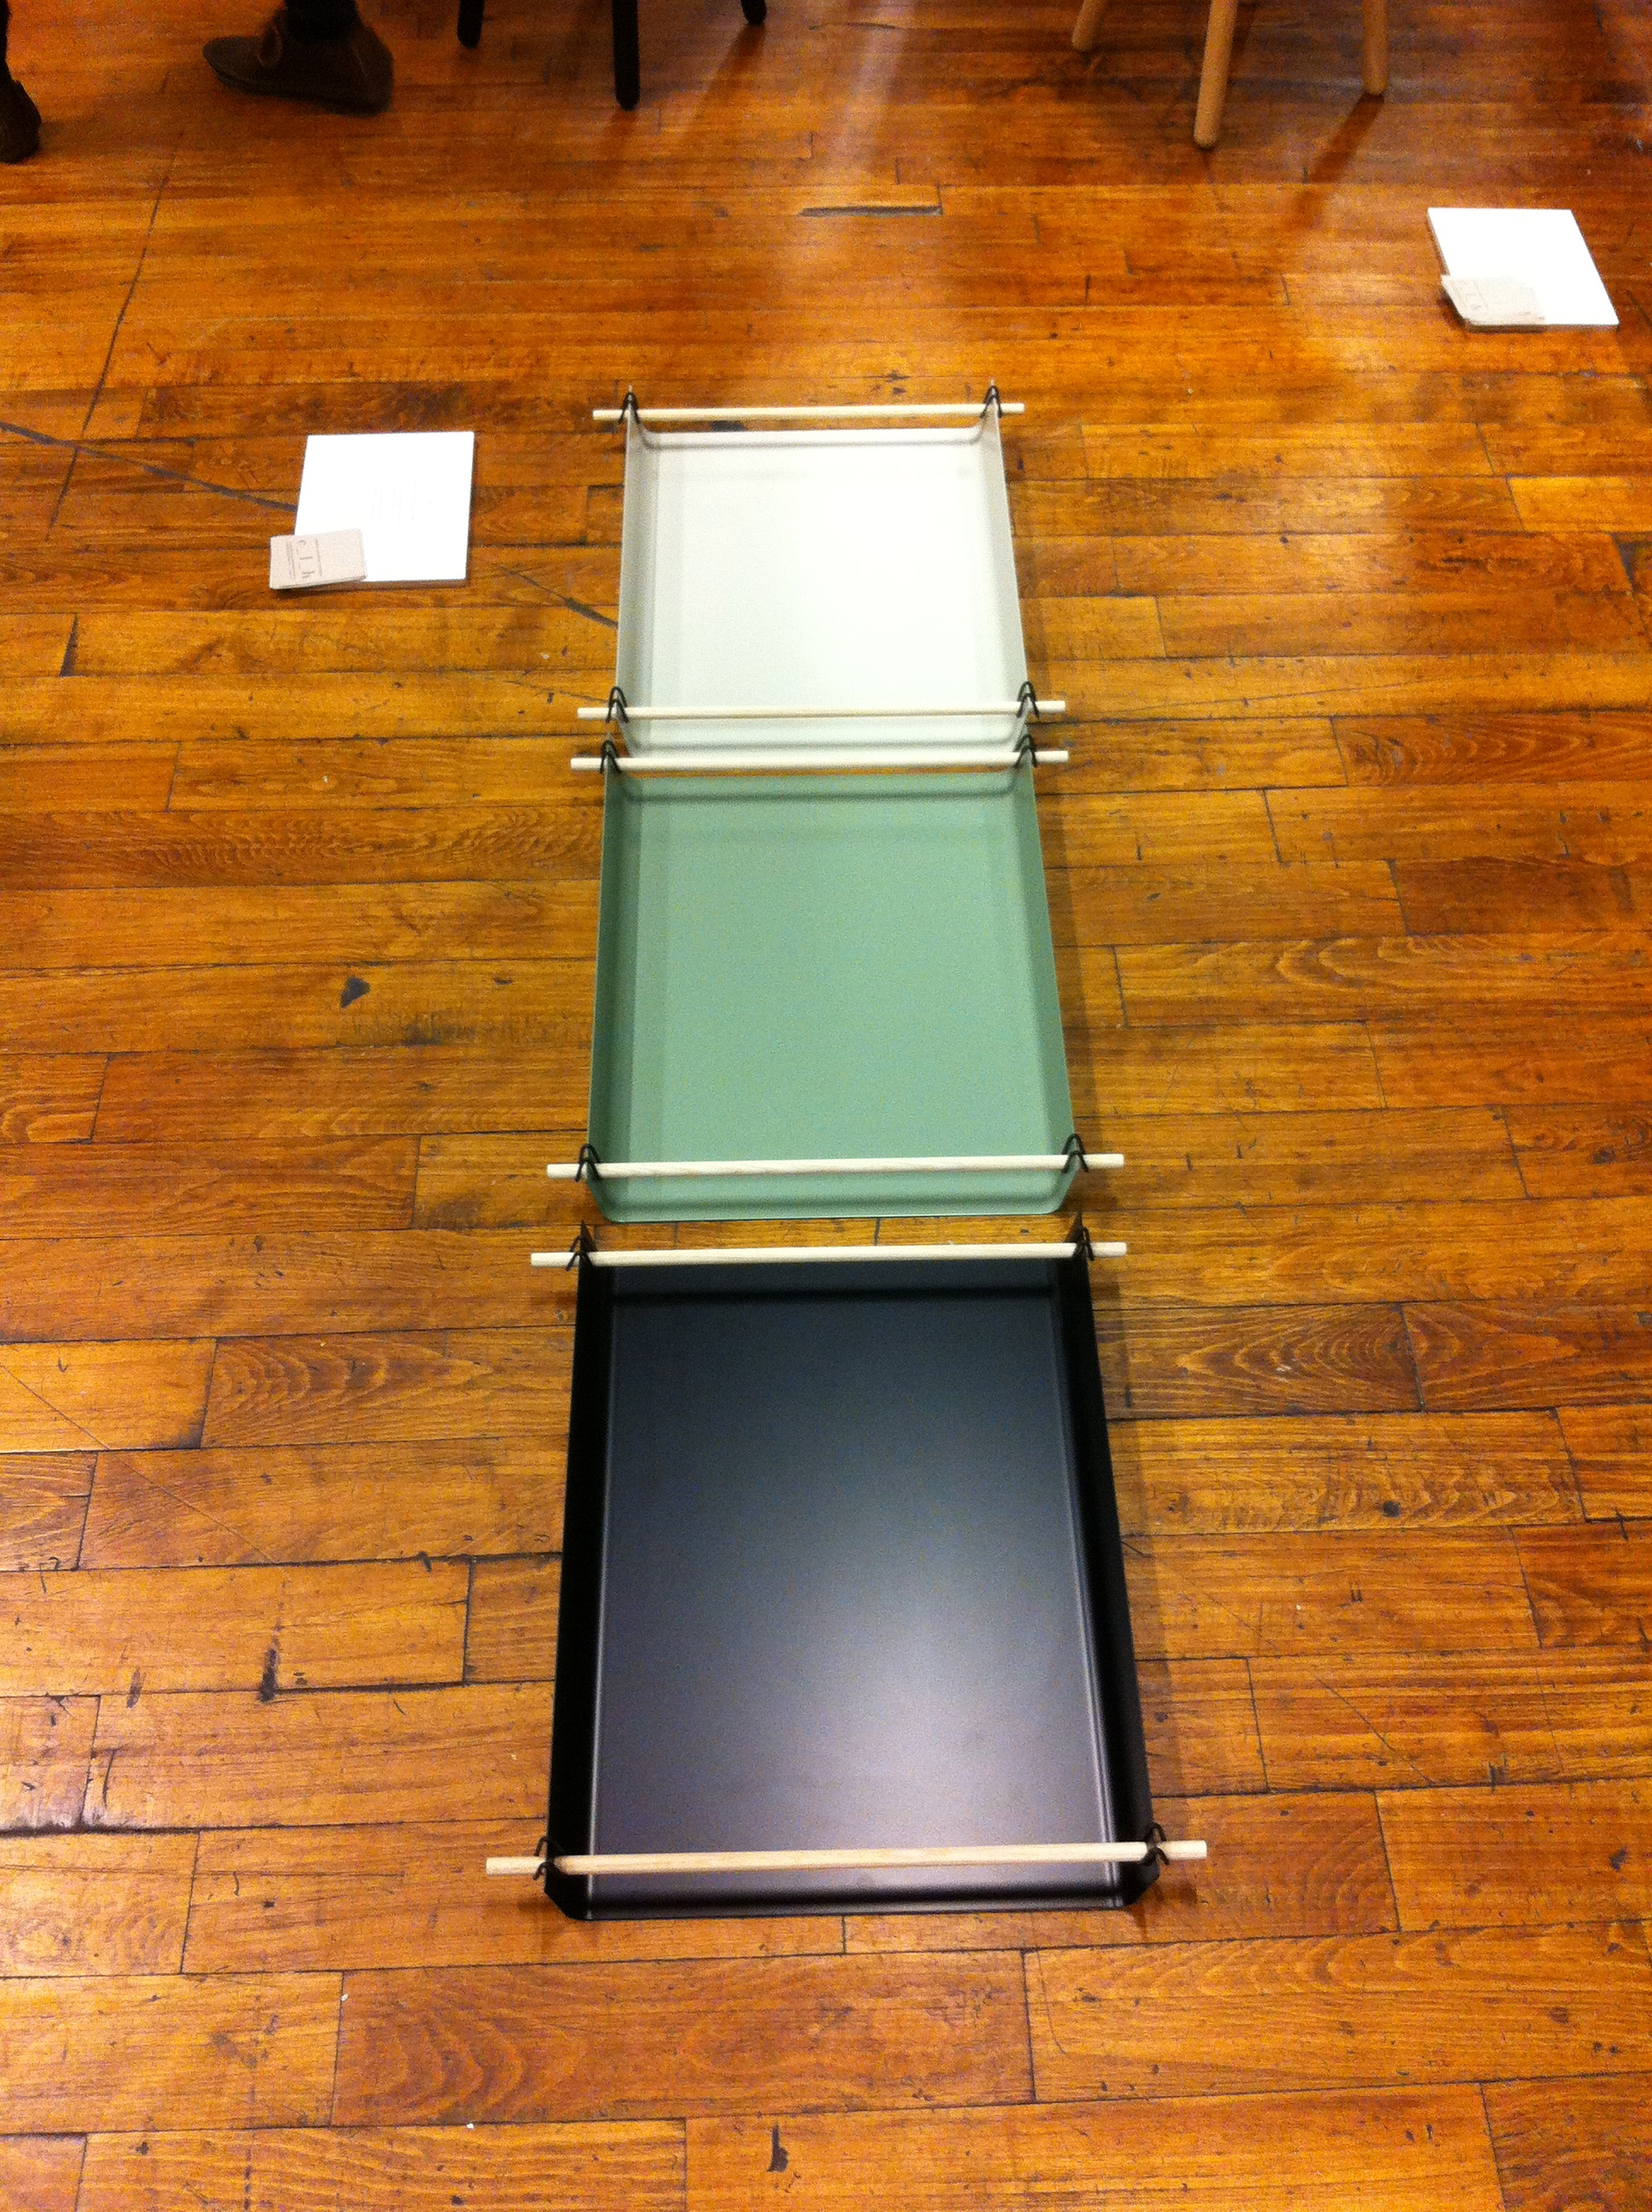 Here are some trays from  Christina Liljenberg Halstrom